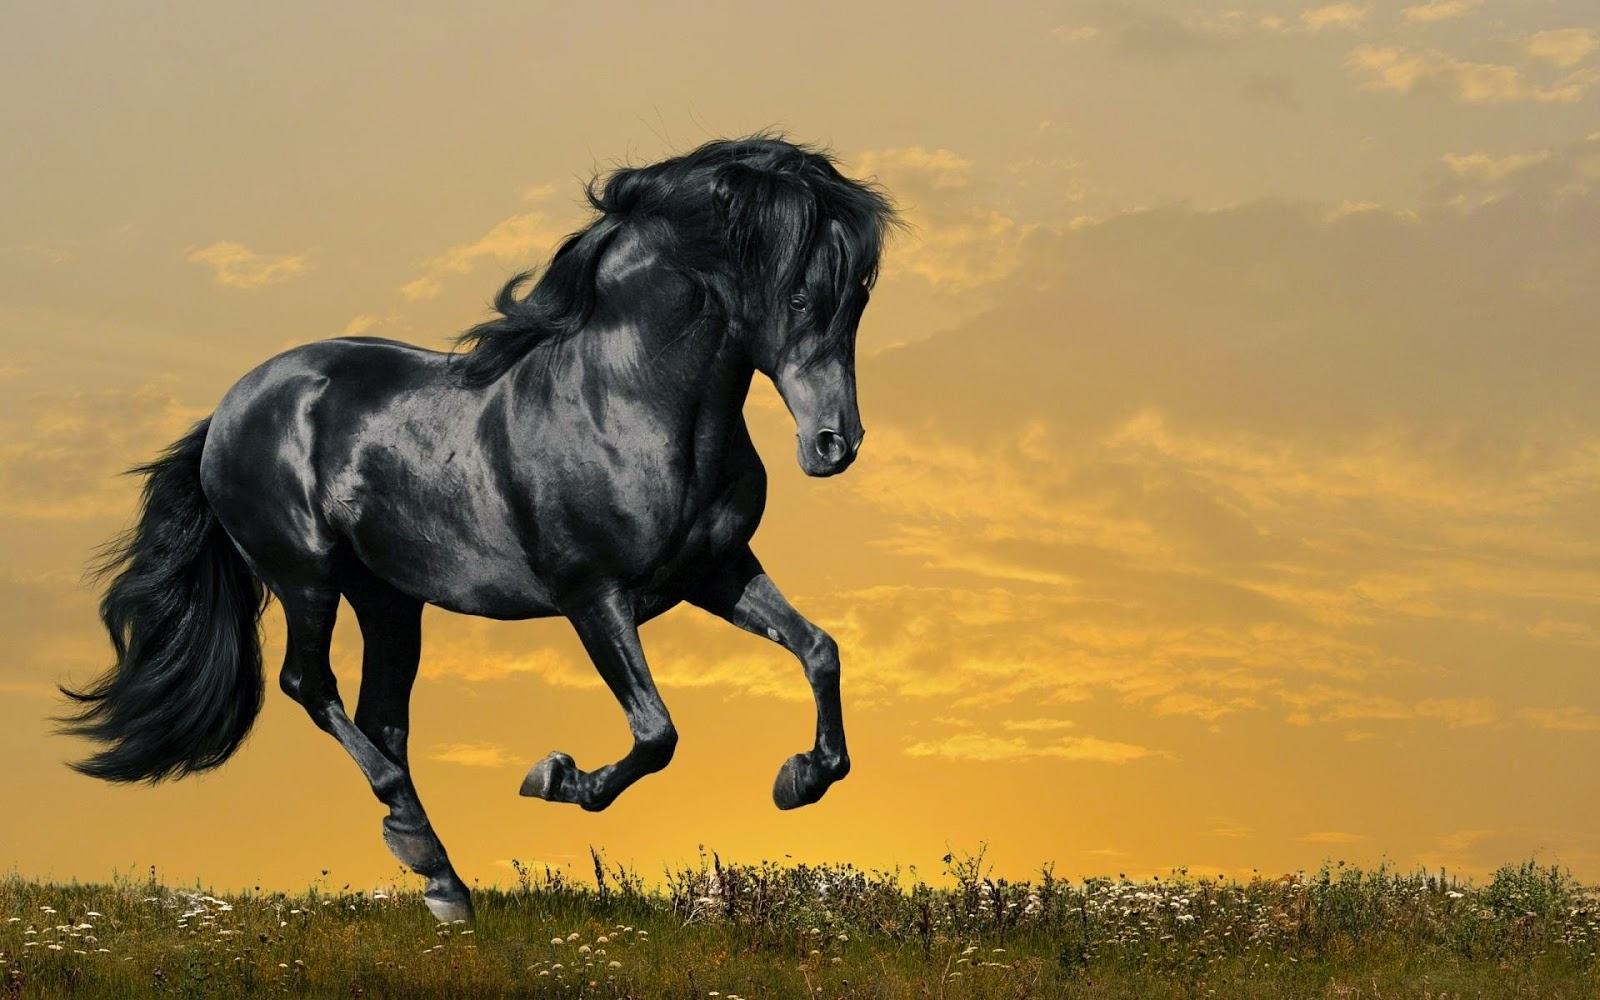 Download   Wallpaper Horse Yellow - beautiful_black_horse_wallpaper_hd  Picture_1007866.jpg